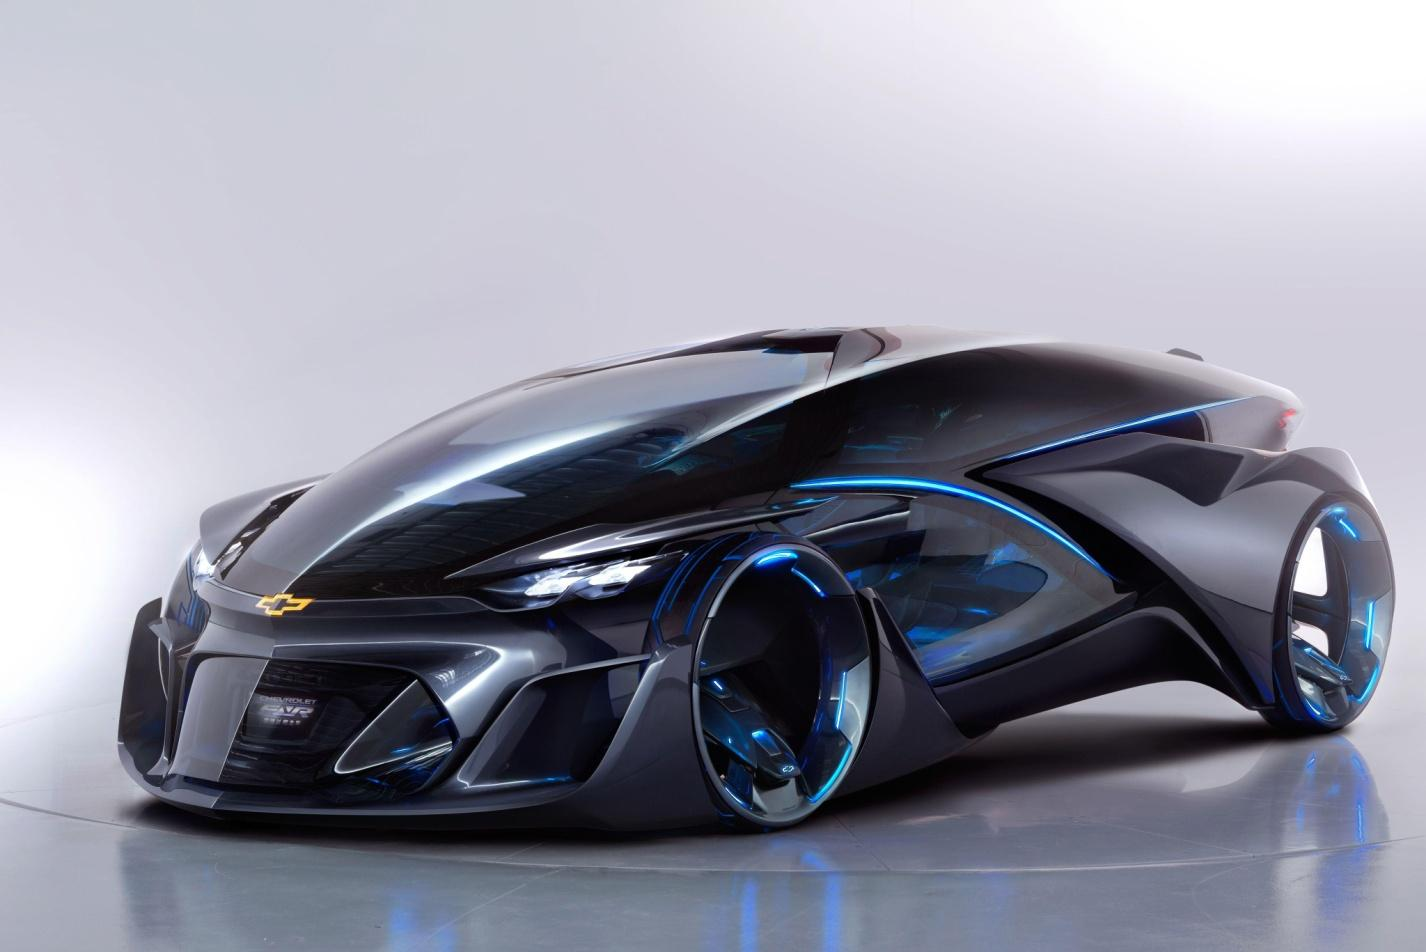 C:\Documents and Settings\Пользователь\Рабочий стол\ЗАКОНОДАВСТВО\2015 Chevrolet FNR Concept 001.jpg